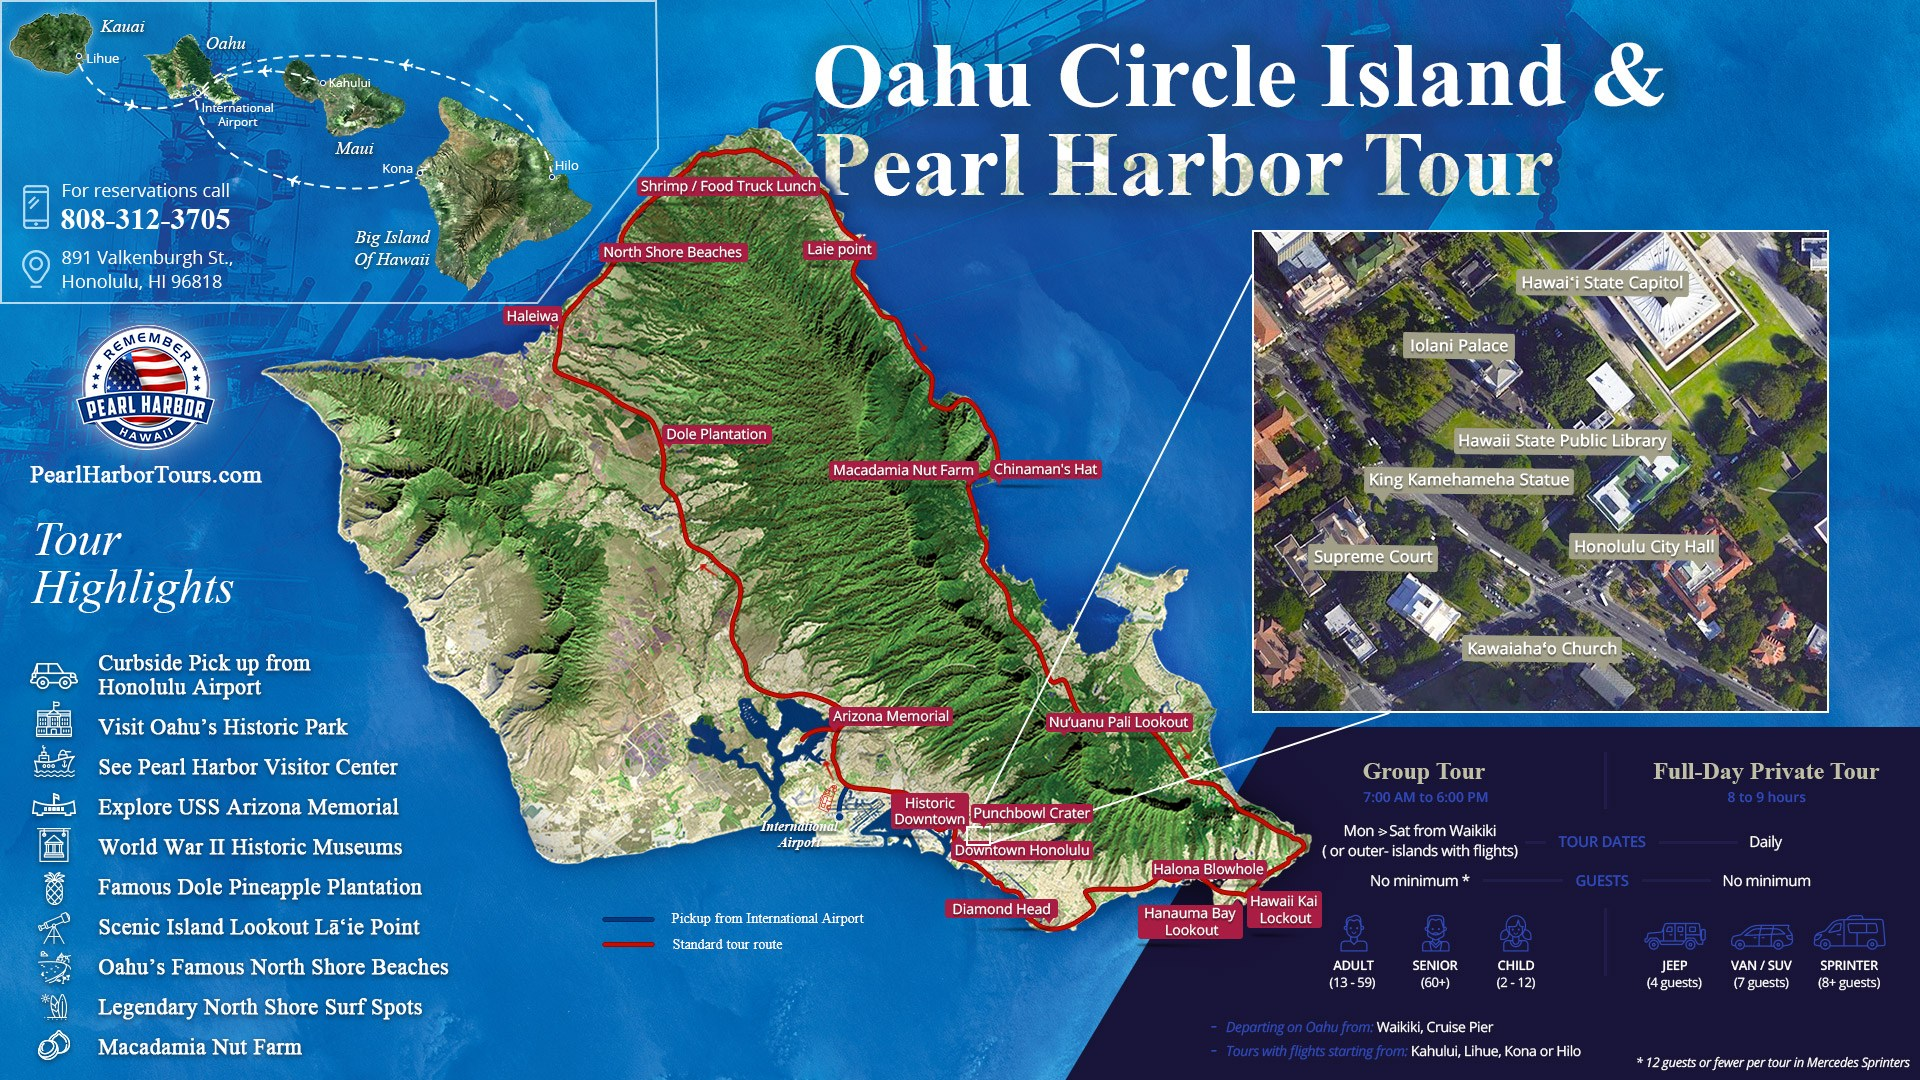 Oahu Circle Island & Pearl Harbor Tour From Maui Big Island of Hawaii or Kauai